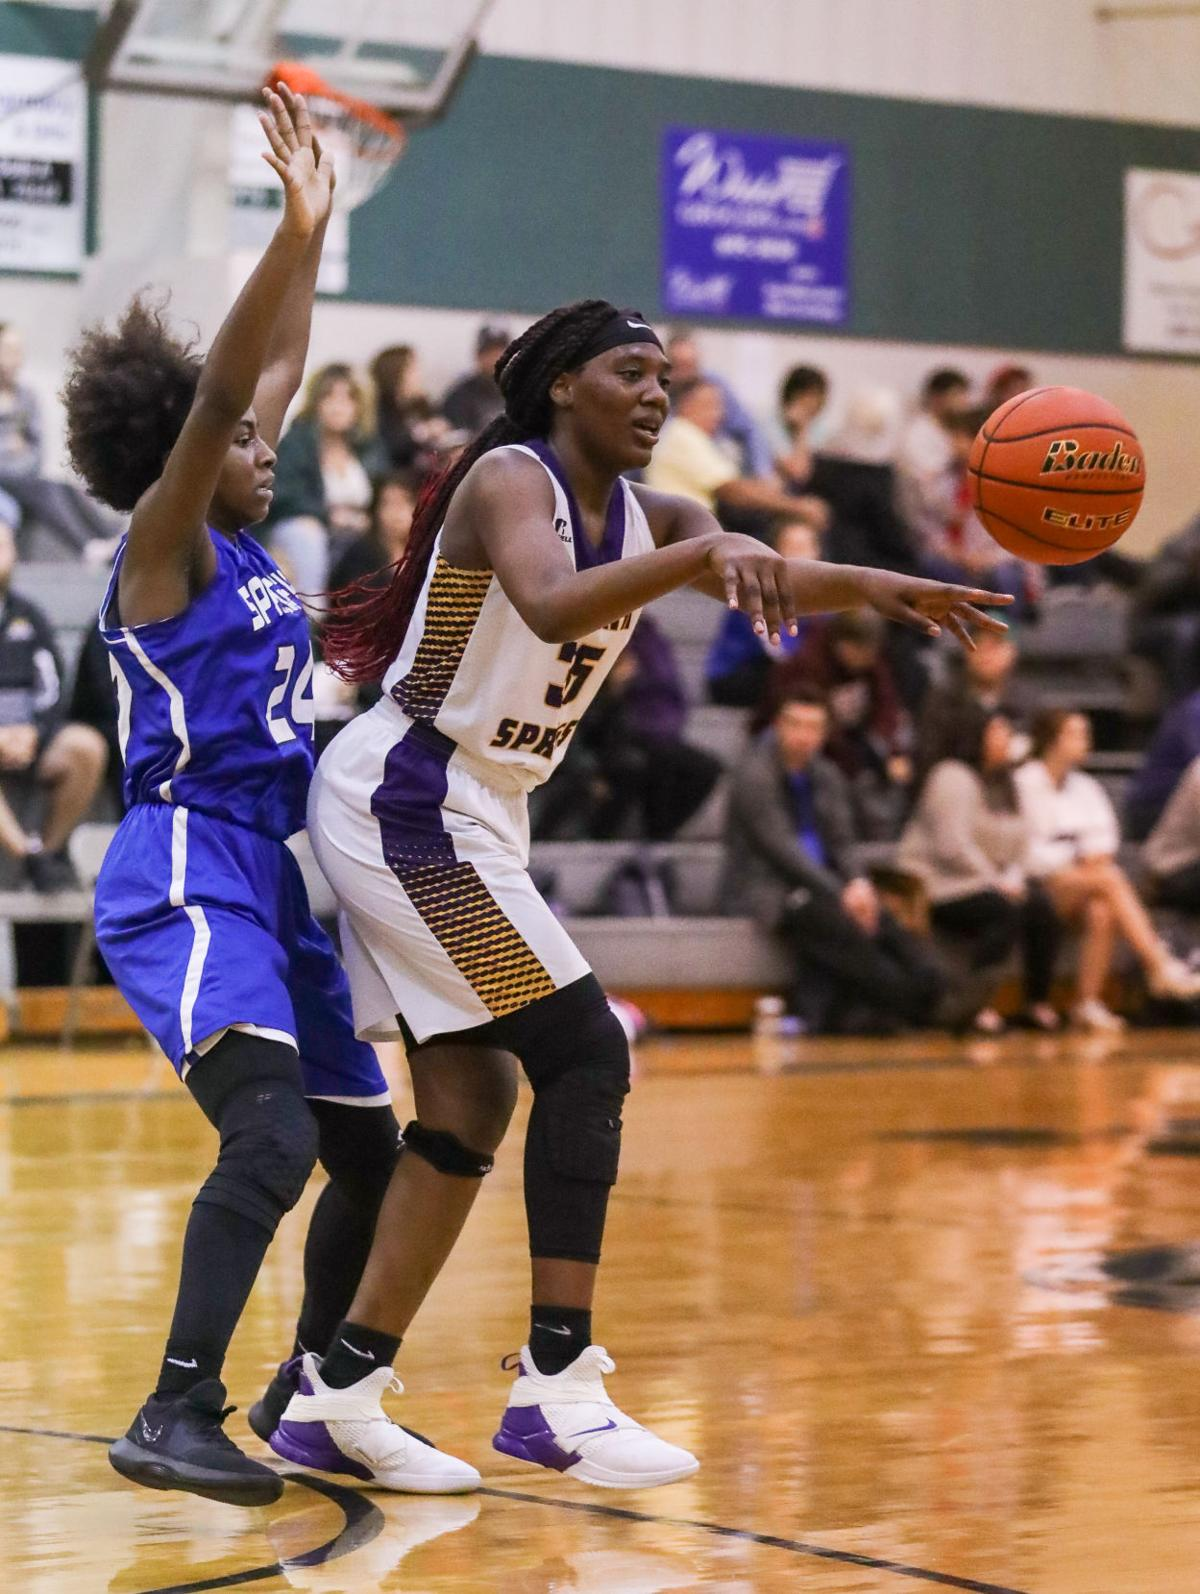 Springfield vs DSHS girls basketball Desiree Jones Johneisha Joseph